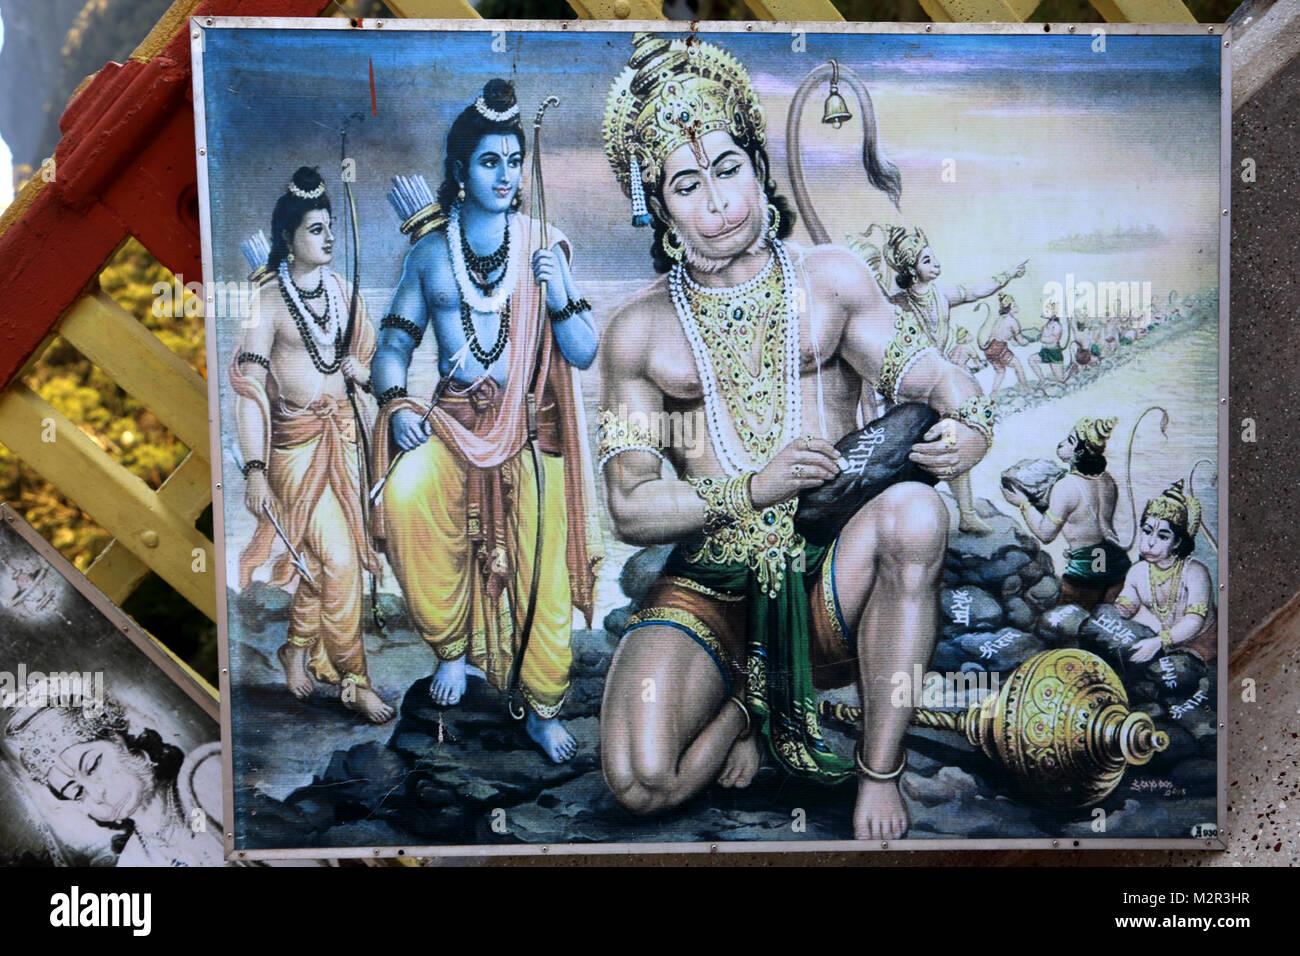 Sita Amman Temple Seetha Eliya Central Province Sri Lanka Said to be the spot where Ravana Held Sita Captive In - Stock Image